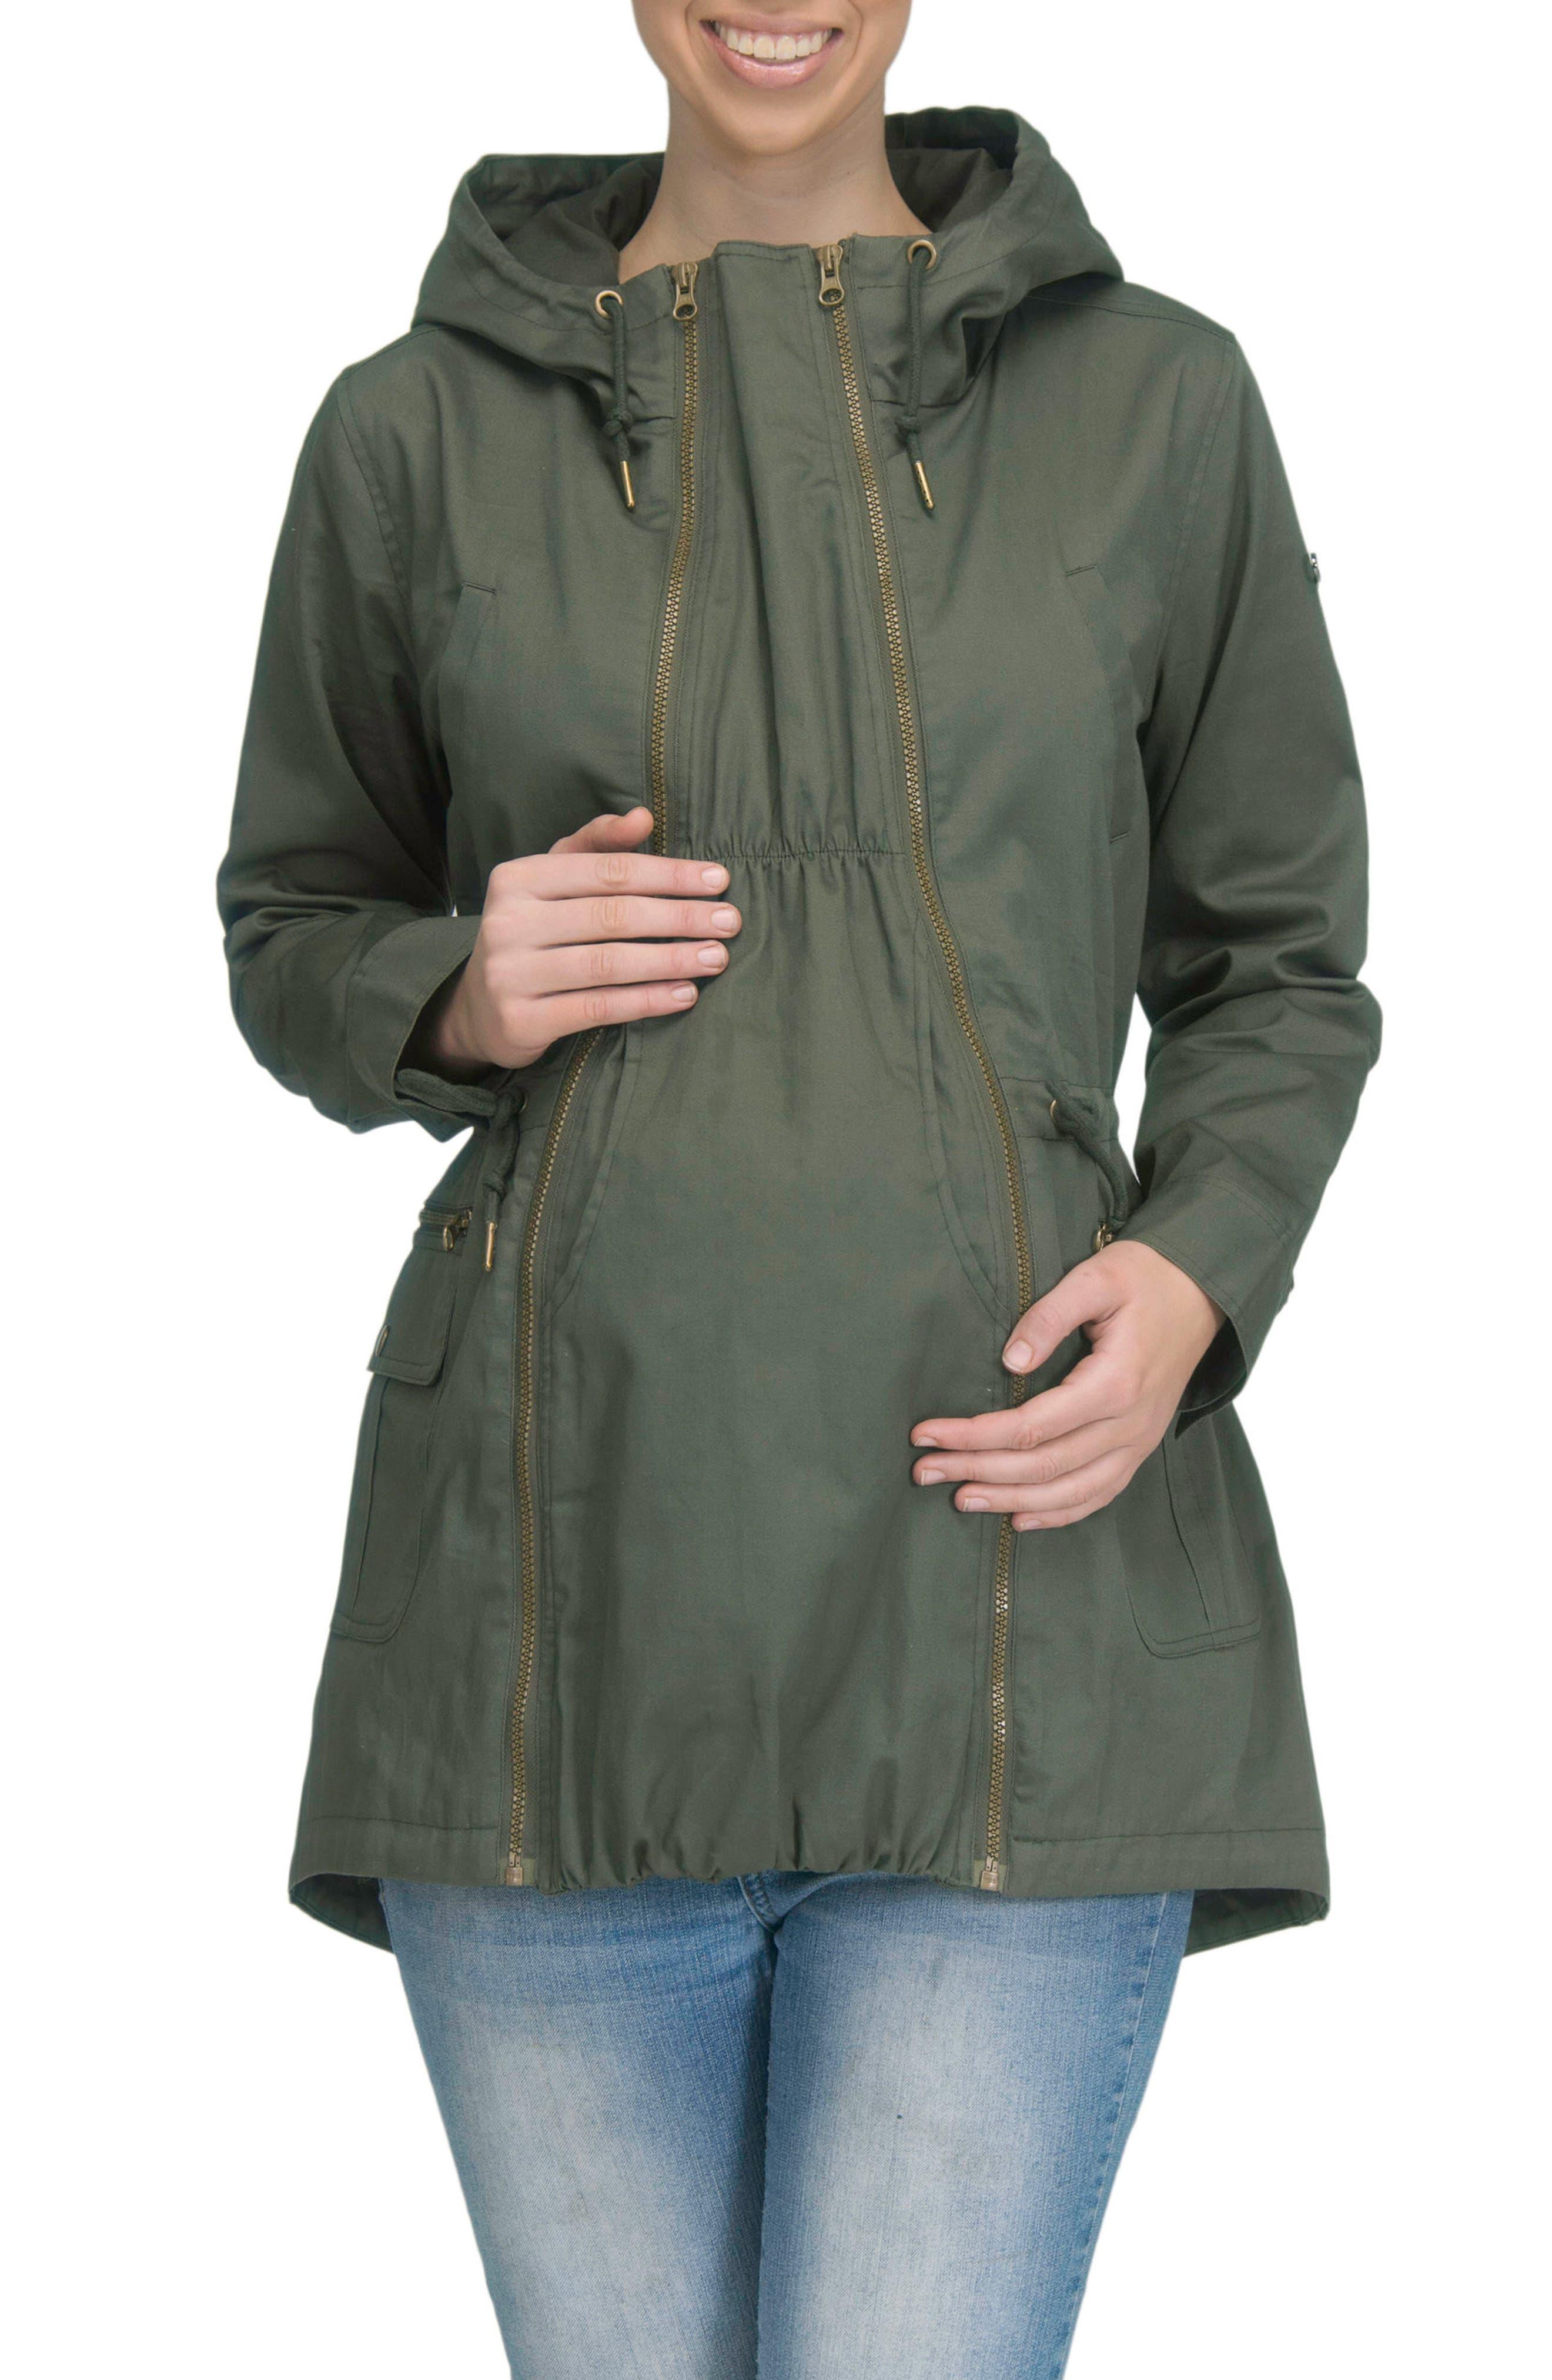 Convertible Military 3-in-1 Maternity/Nursing Jacket,                             Alternate thumbnail 2, color,                             KHAKI GREEN